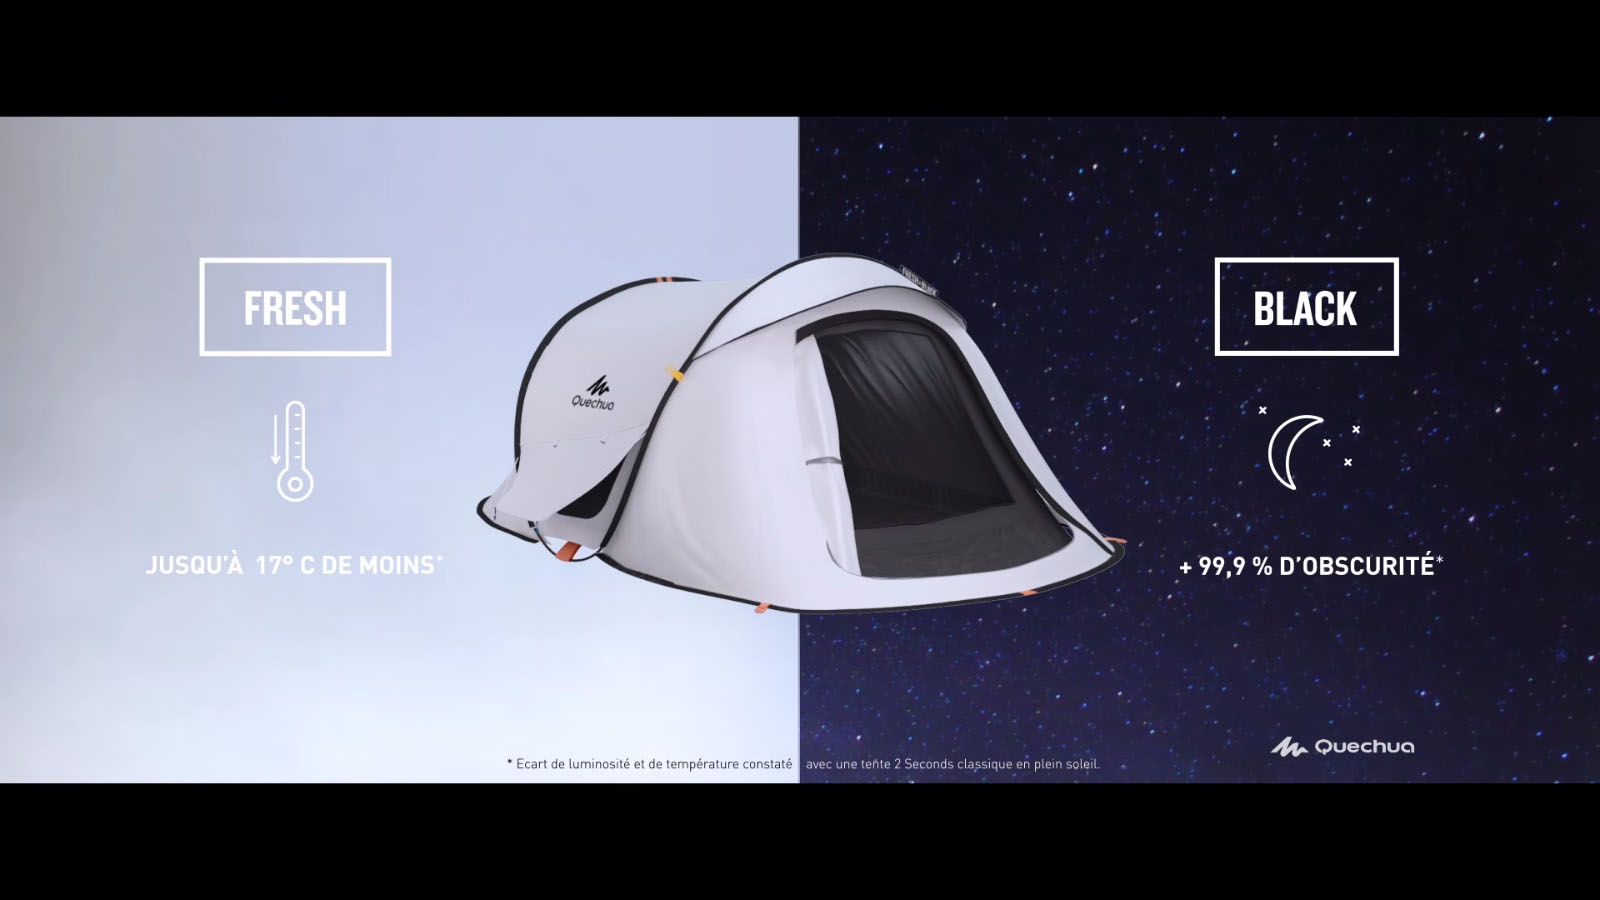 pub advert tente tienda tiende zelt quechua decathlon fresh black light obscurity 2second 2 3 4. Black Bedroom Furniture Sets. Home Design Ideas